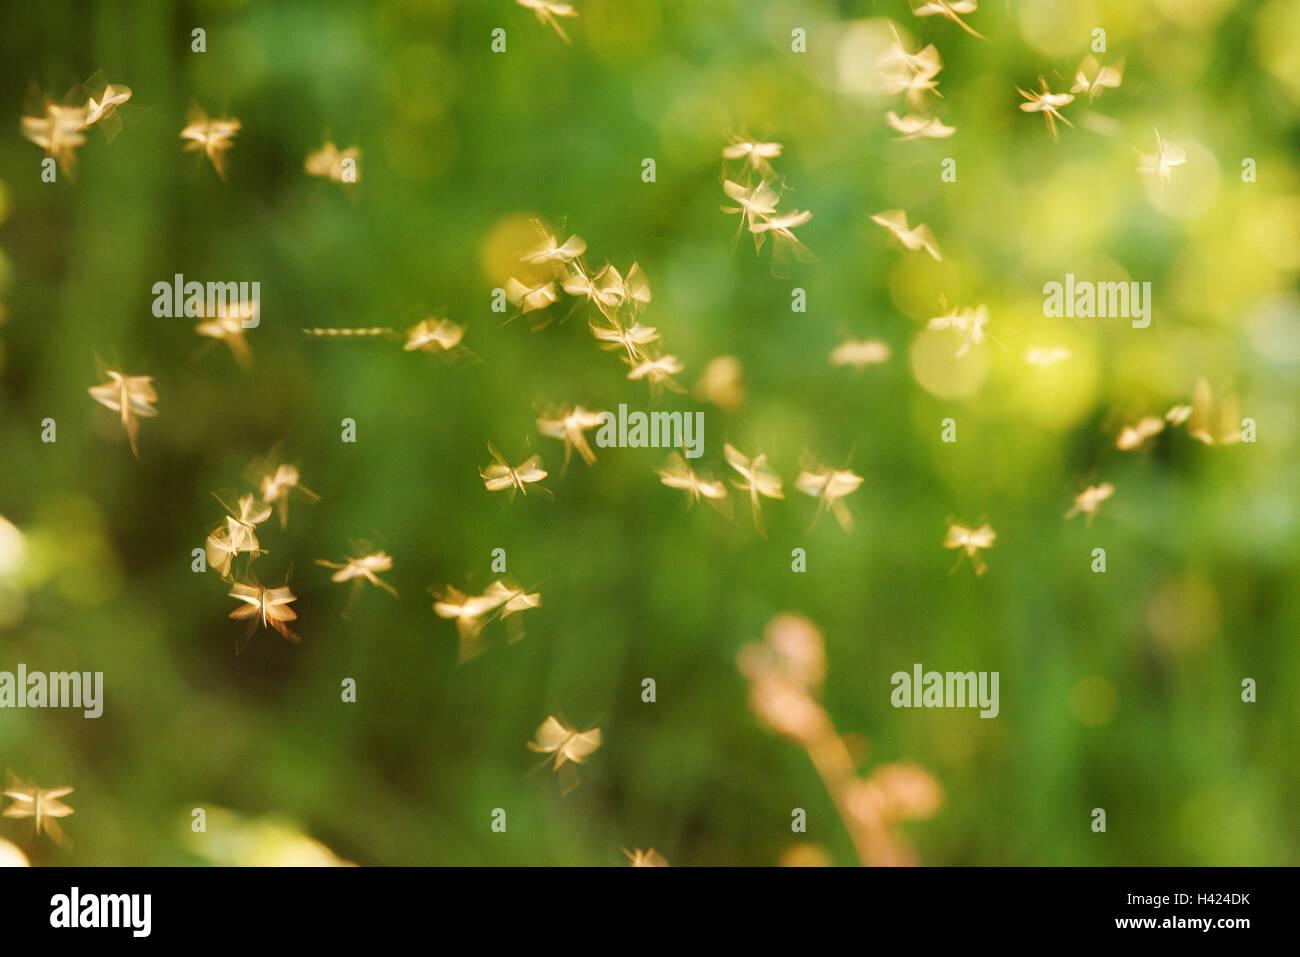 Enjambre de mosquitos, Back Light, insectos, Stechmücken, mosquitos, mosquitos, Culicidae Gelsen chupasangres, Imagen De Stock